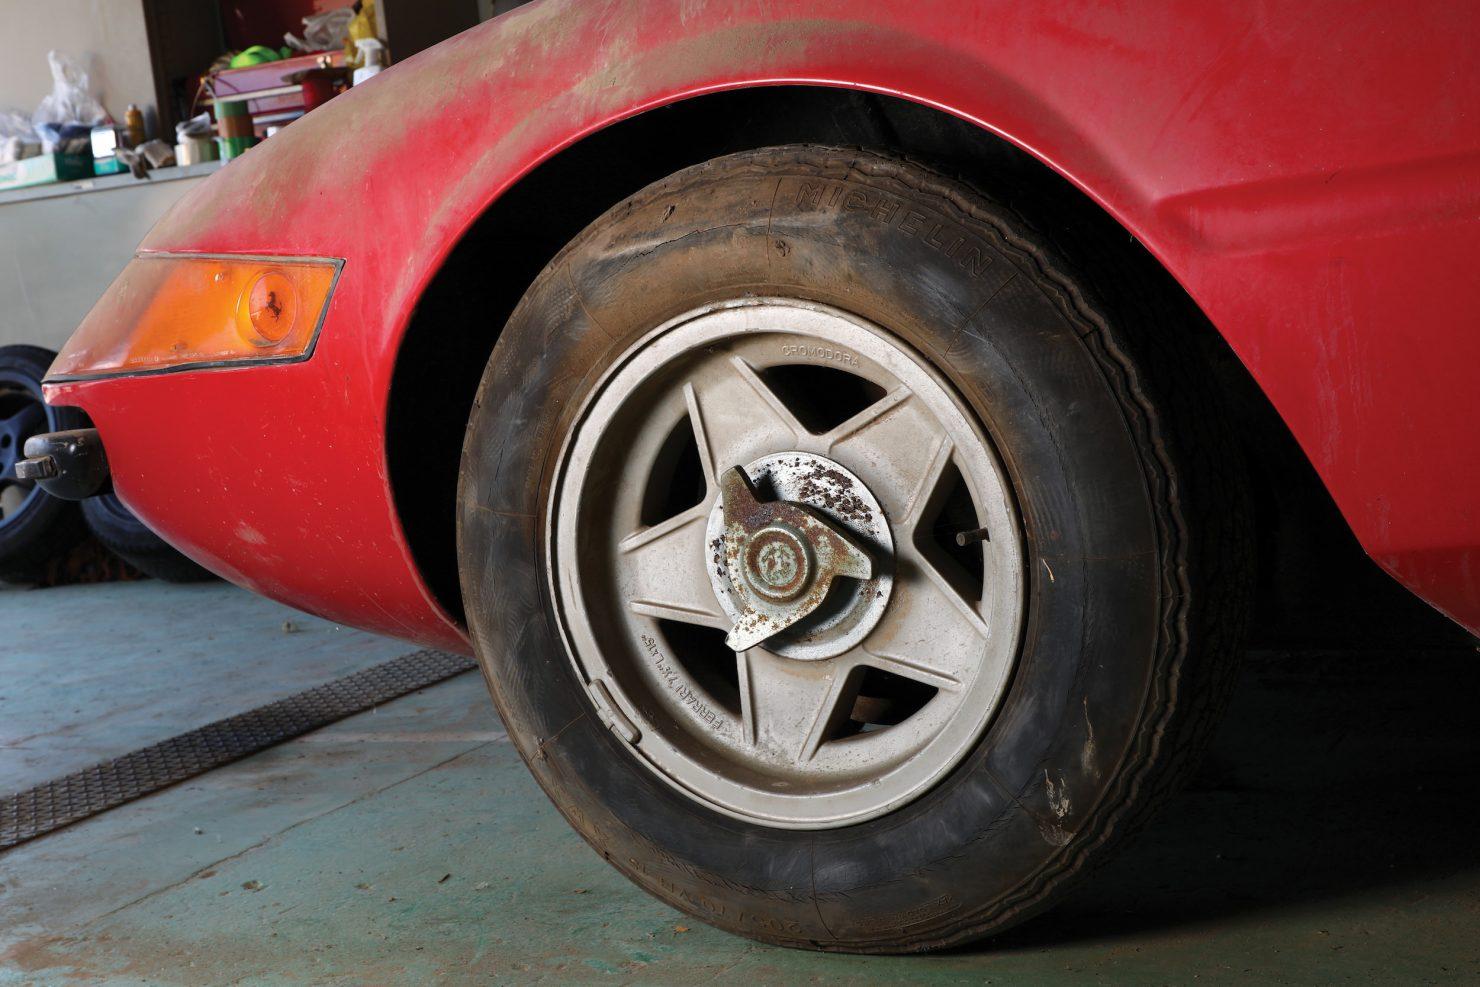 Ferrari 365 GTB4 Daytona Alloy 9 1480x987 - Barn Find: 1969 Ferrari 365 GTB/4 Daytona Alloy